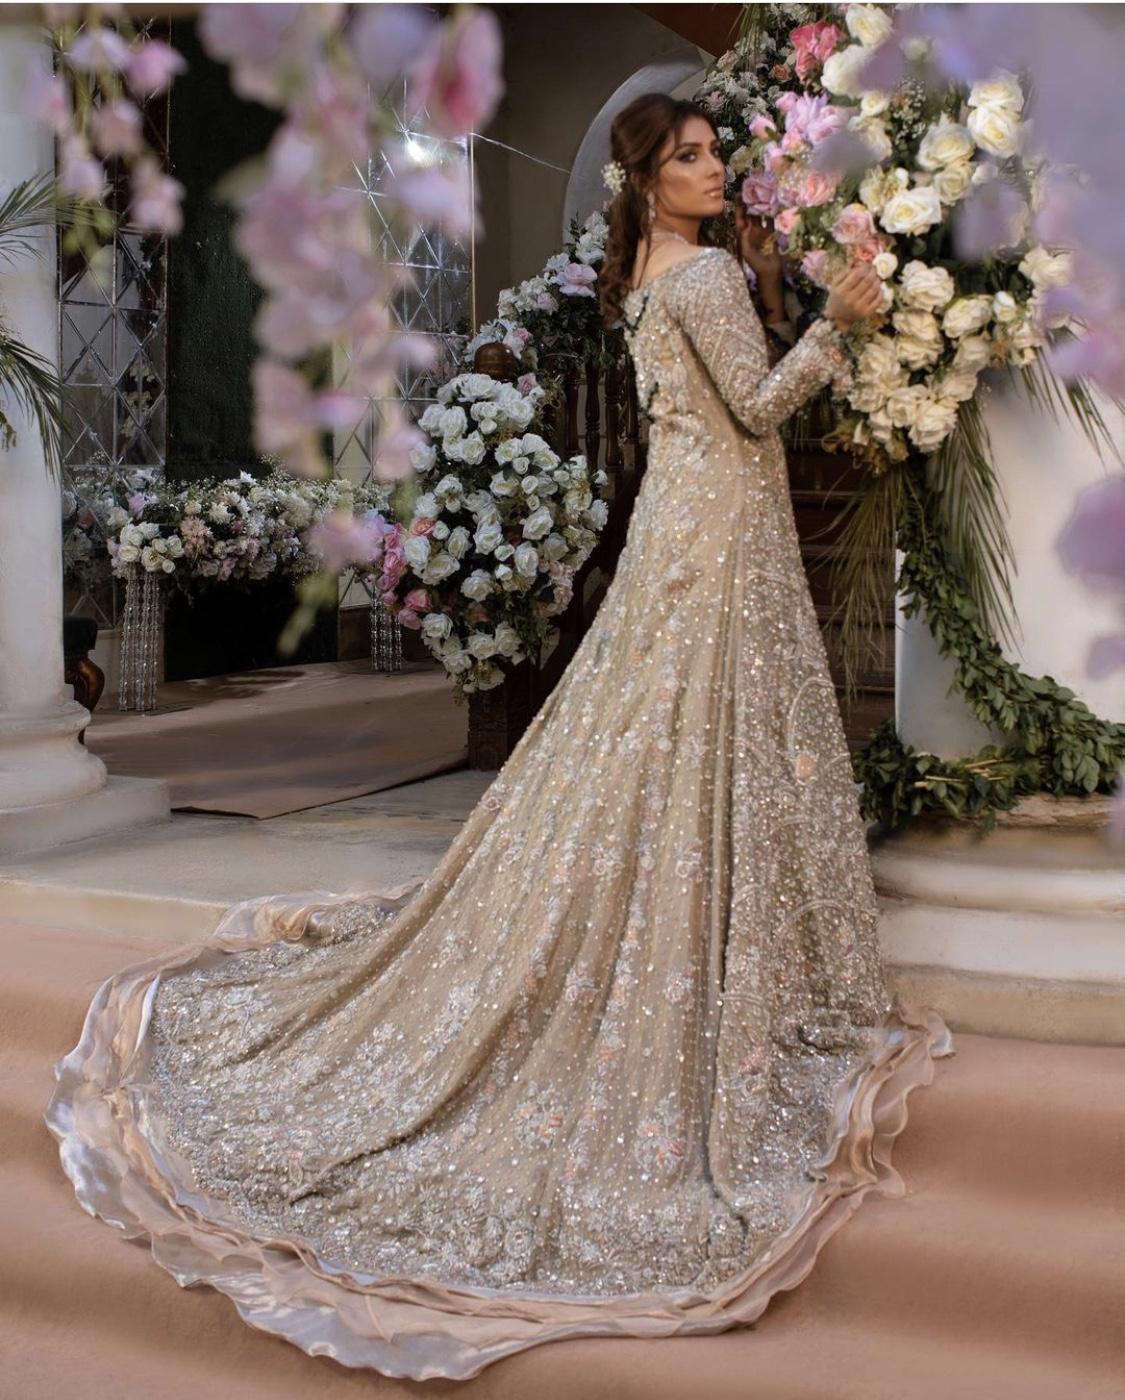 Ayeza Khan Bridal Photoshoot the odd onee